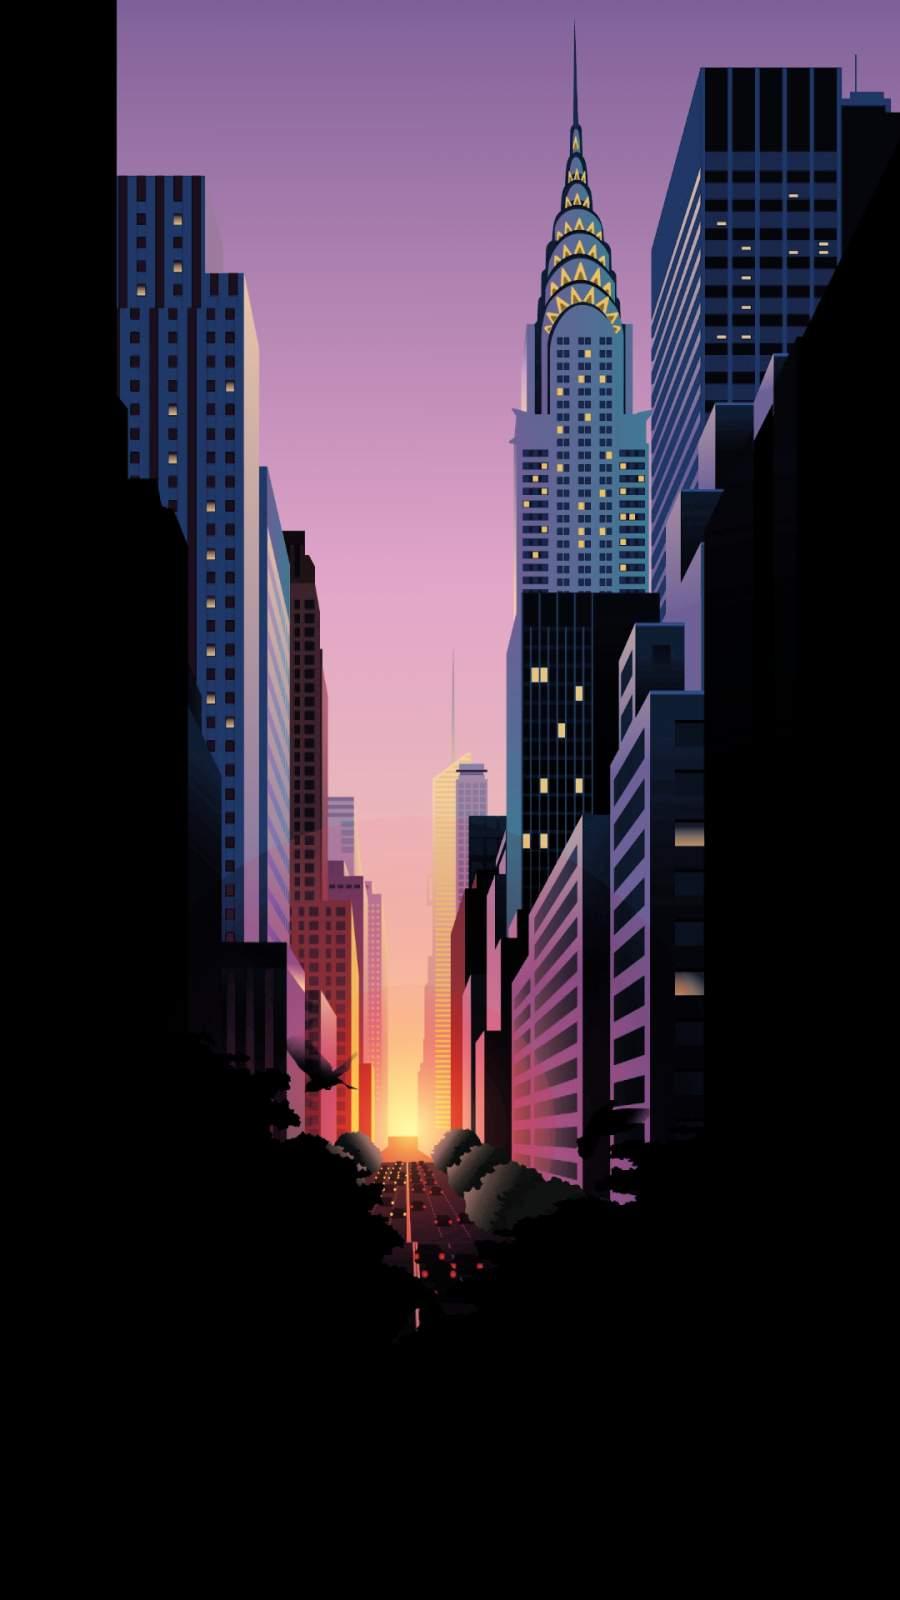 Sunset New York iPhone Wallpaper